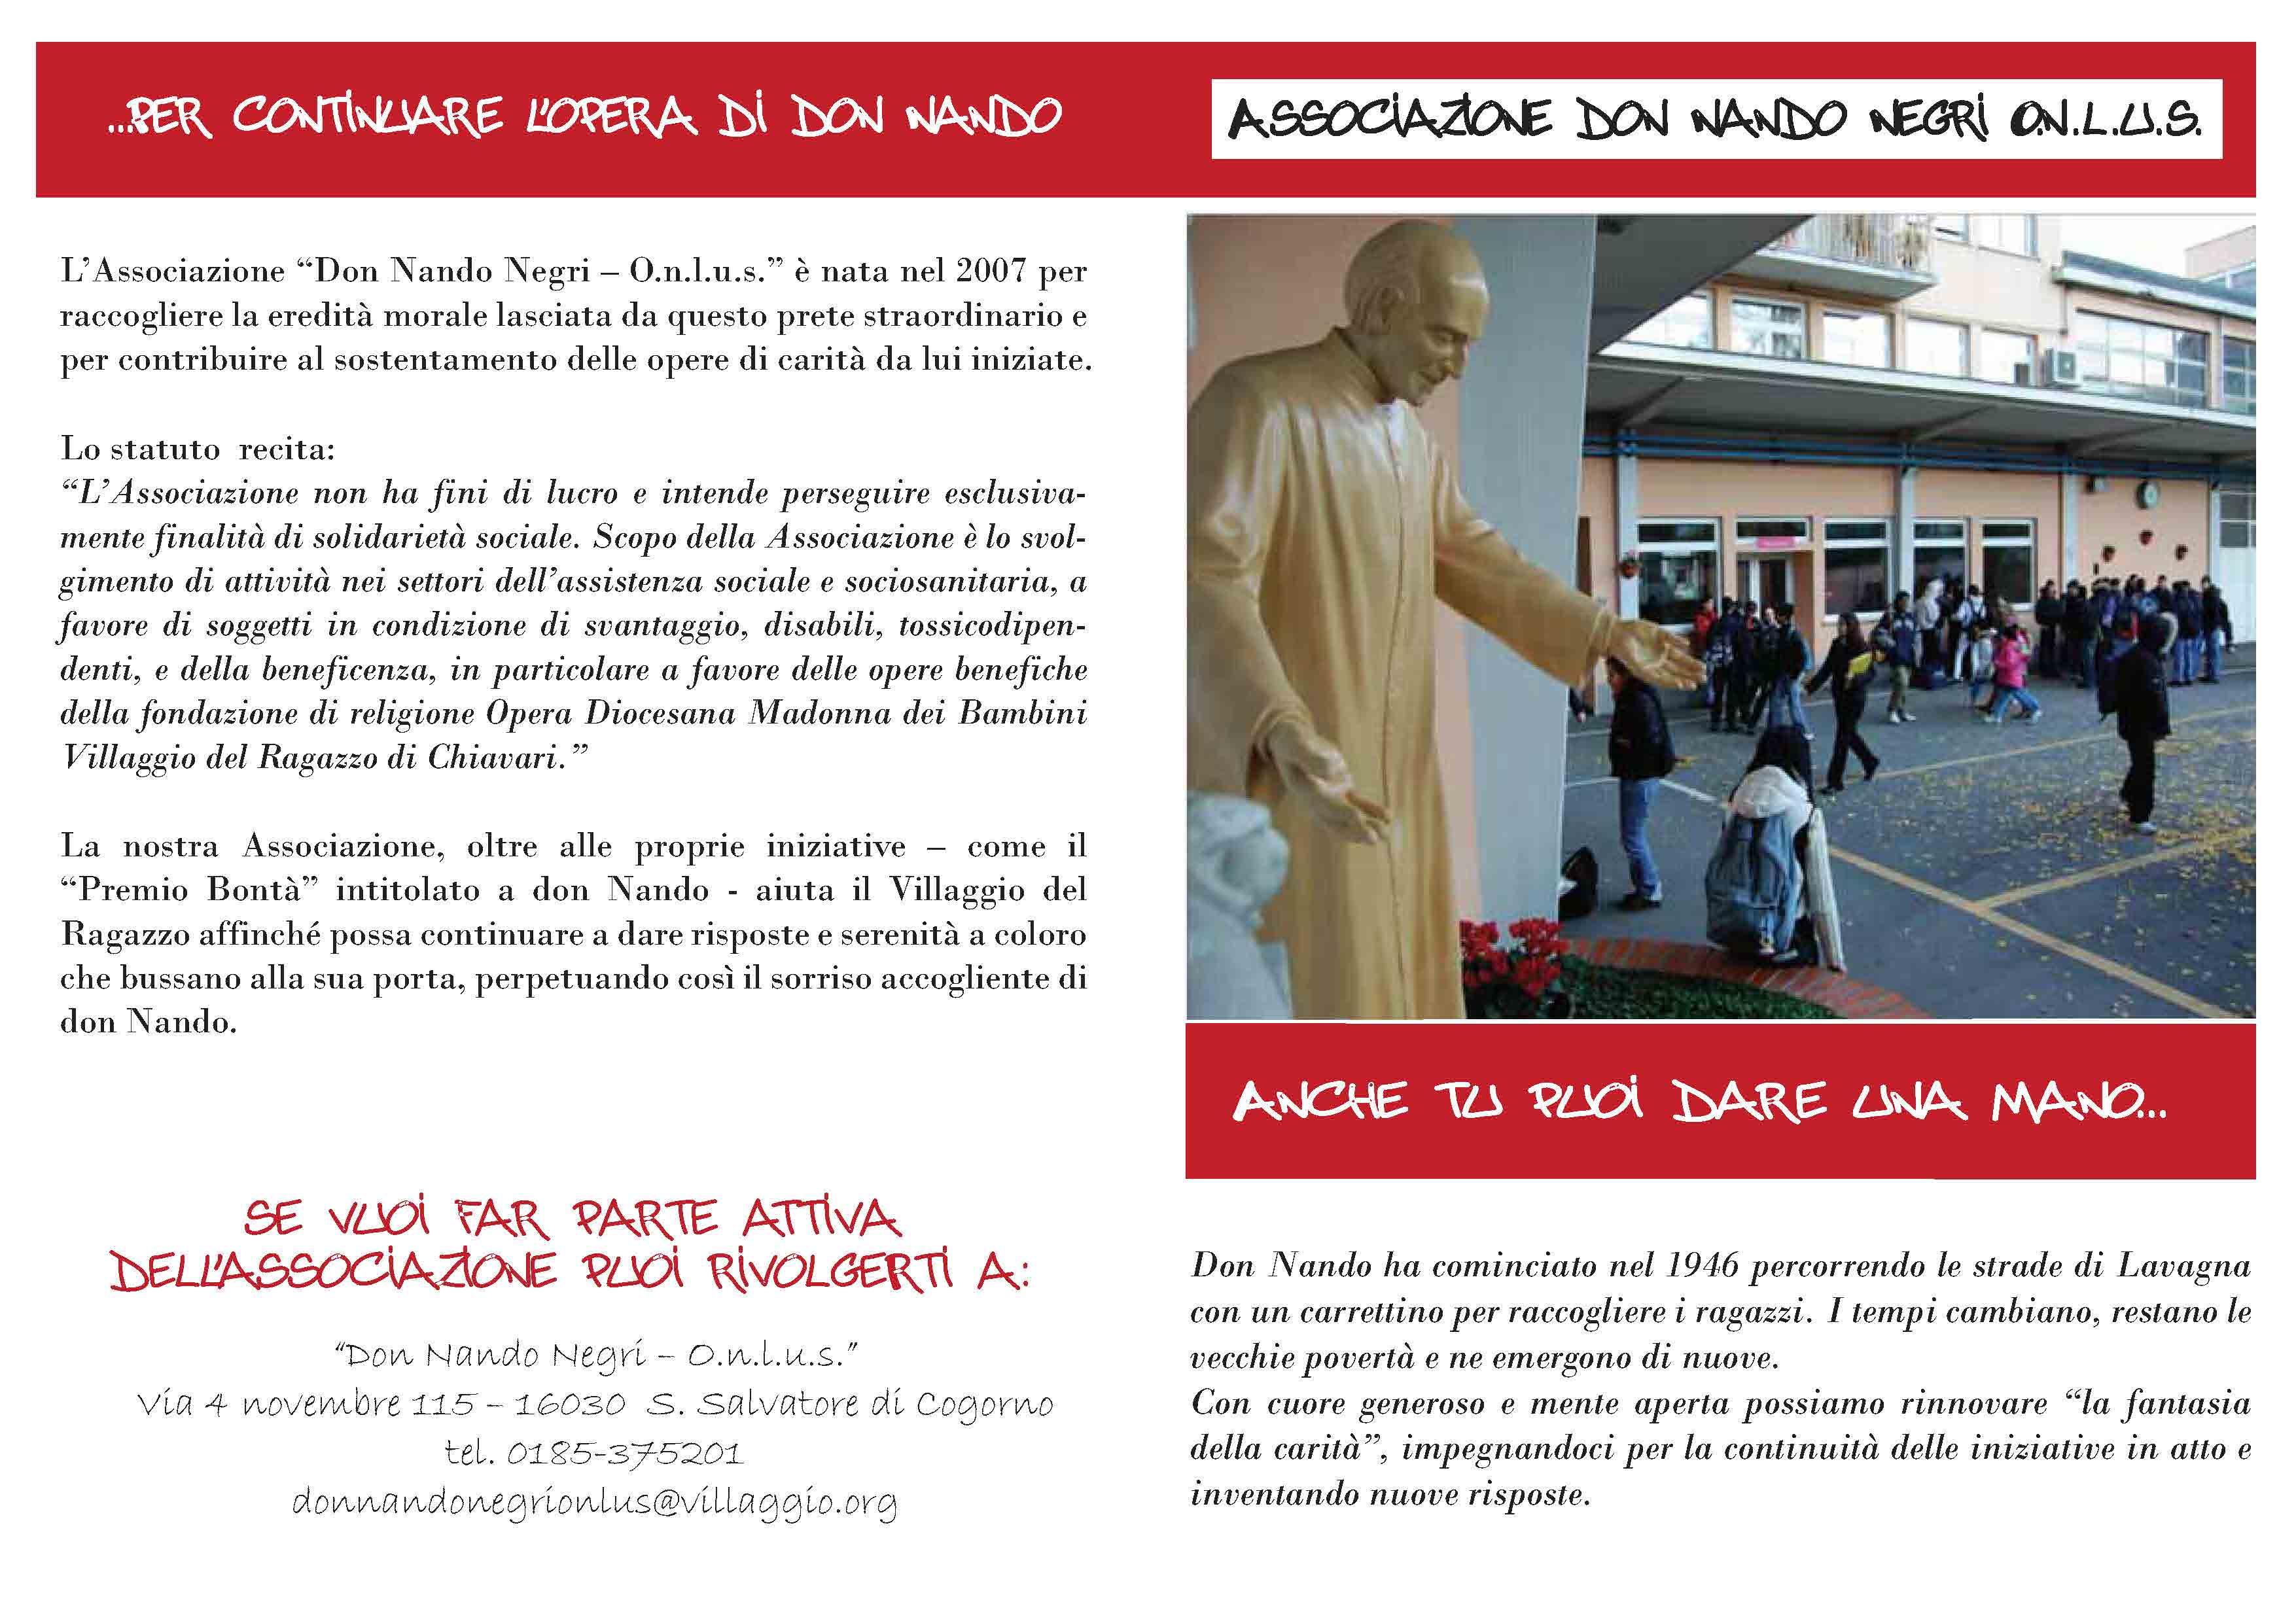 brochure-associazione-don-nando-negri-onlus-01